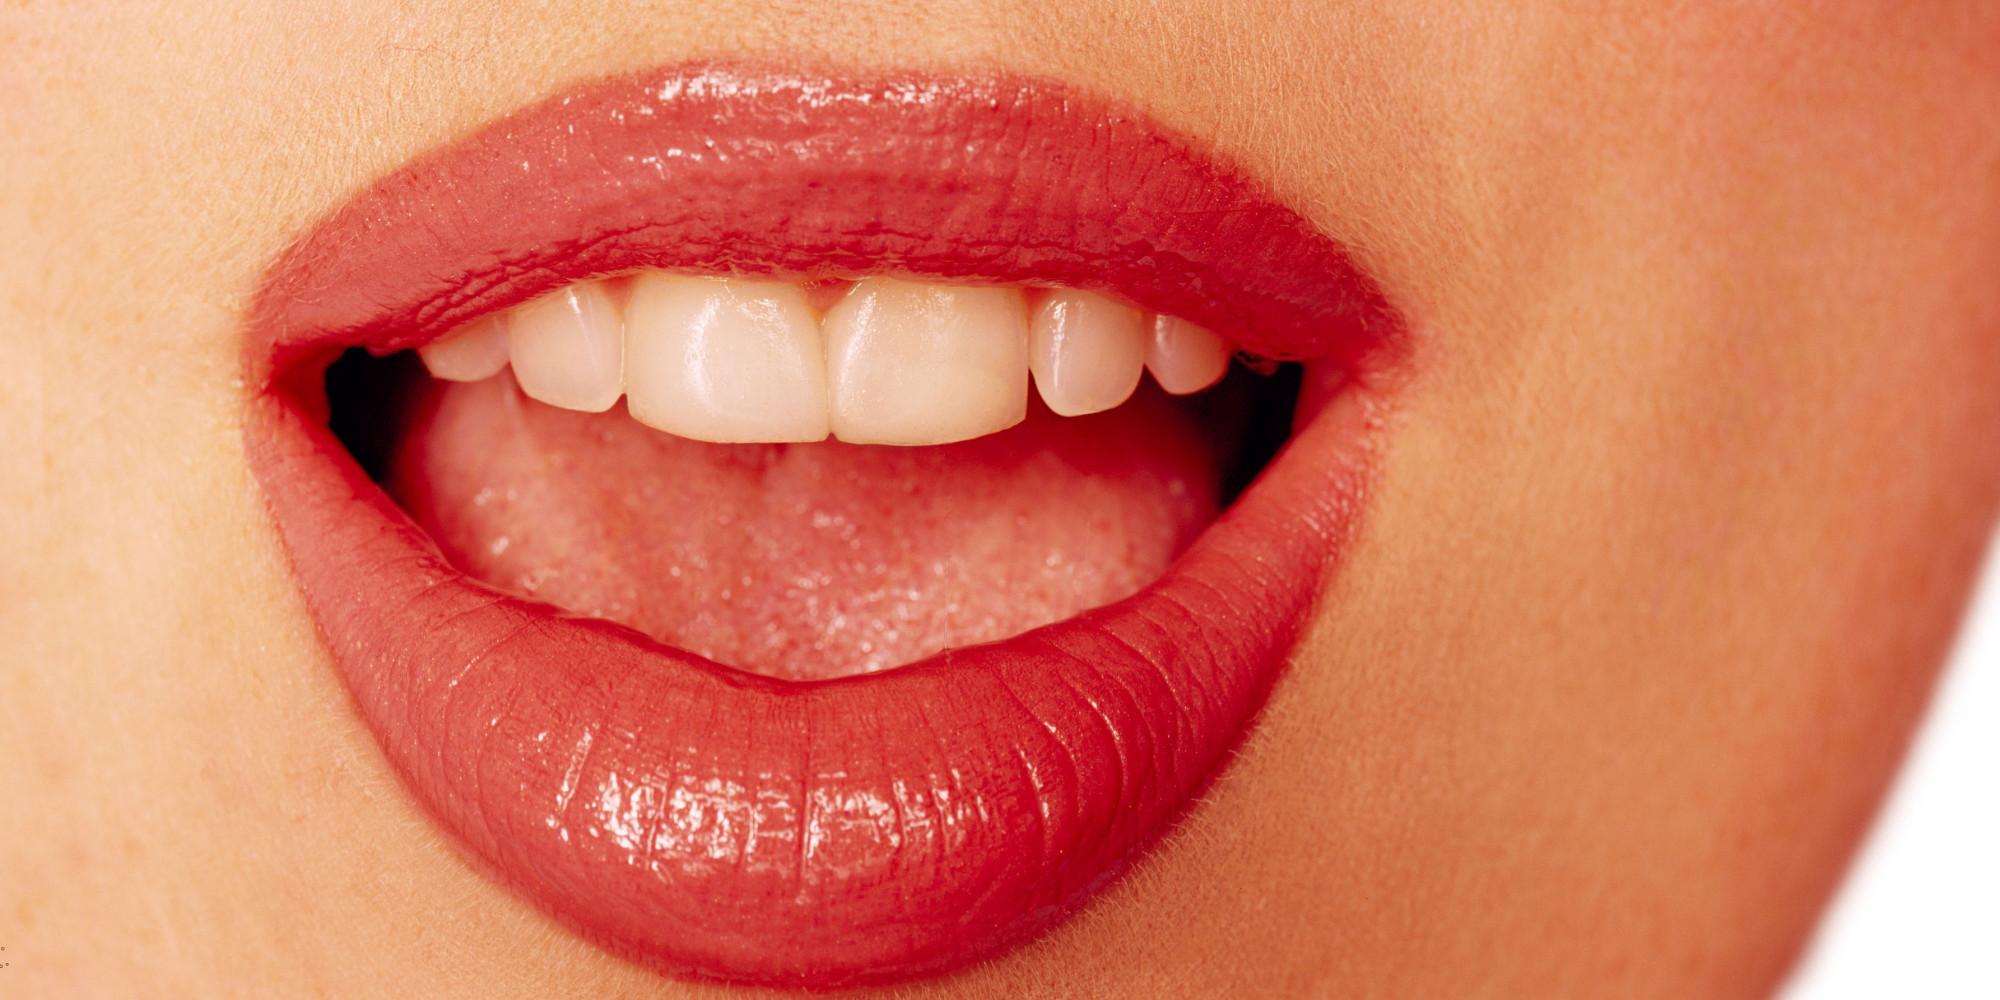 Картинка губы с зубами